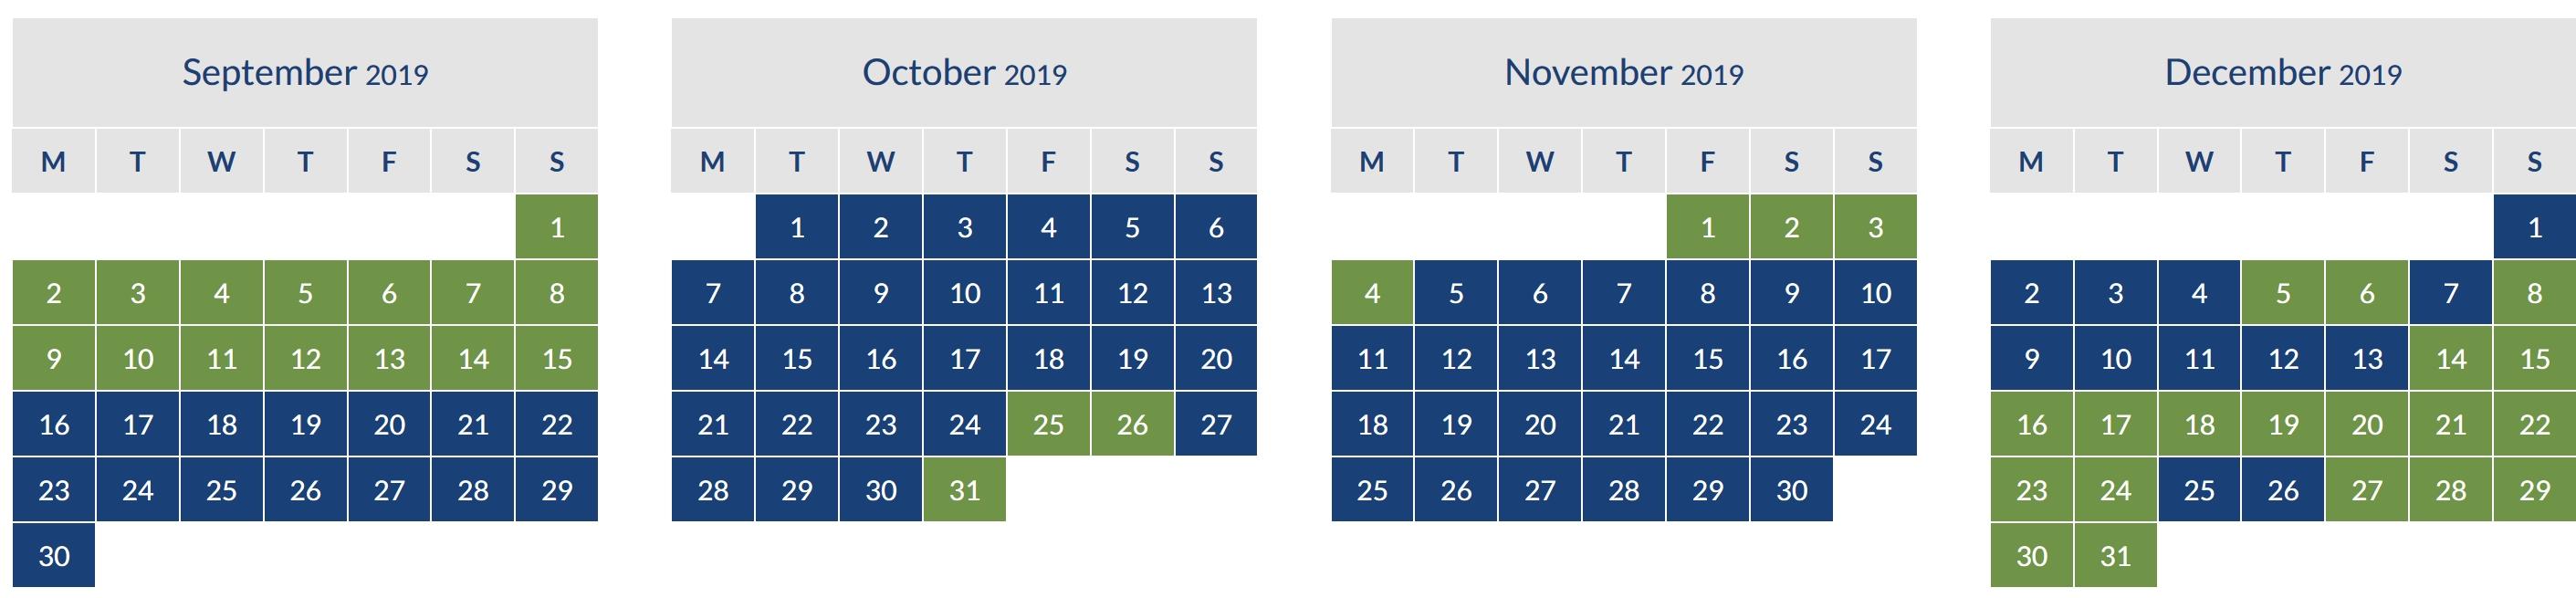 Iberia Avios off peak calendar 2019